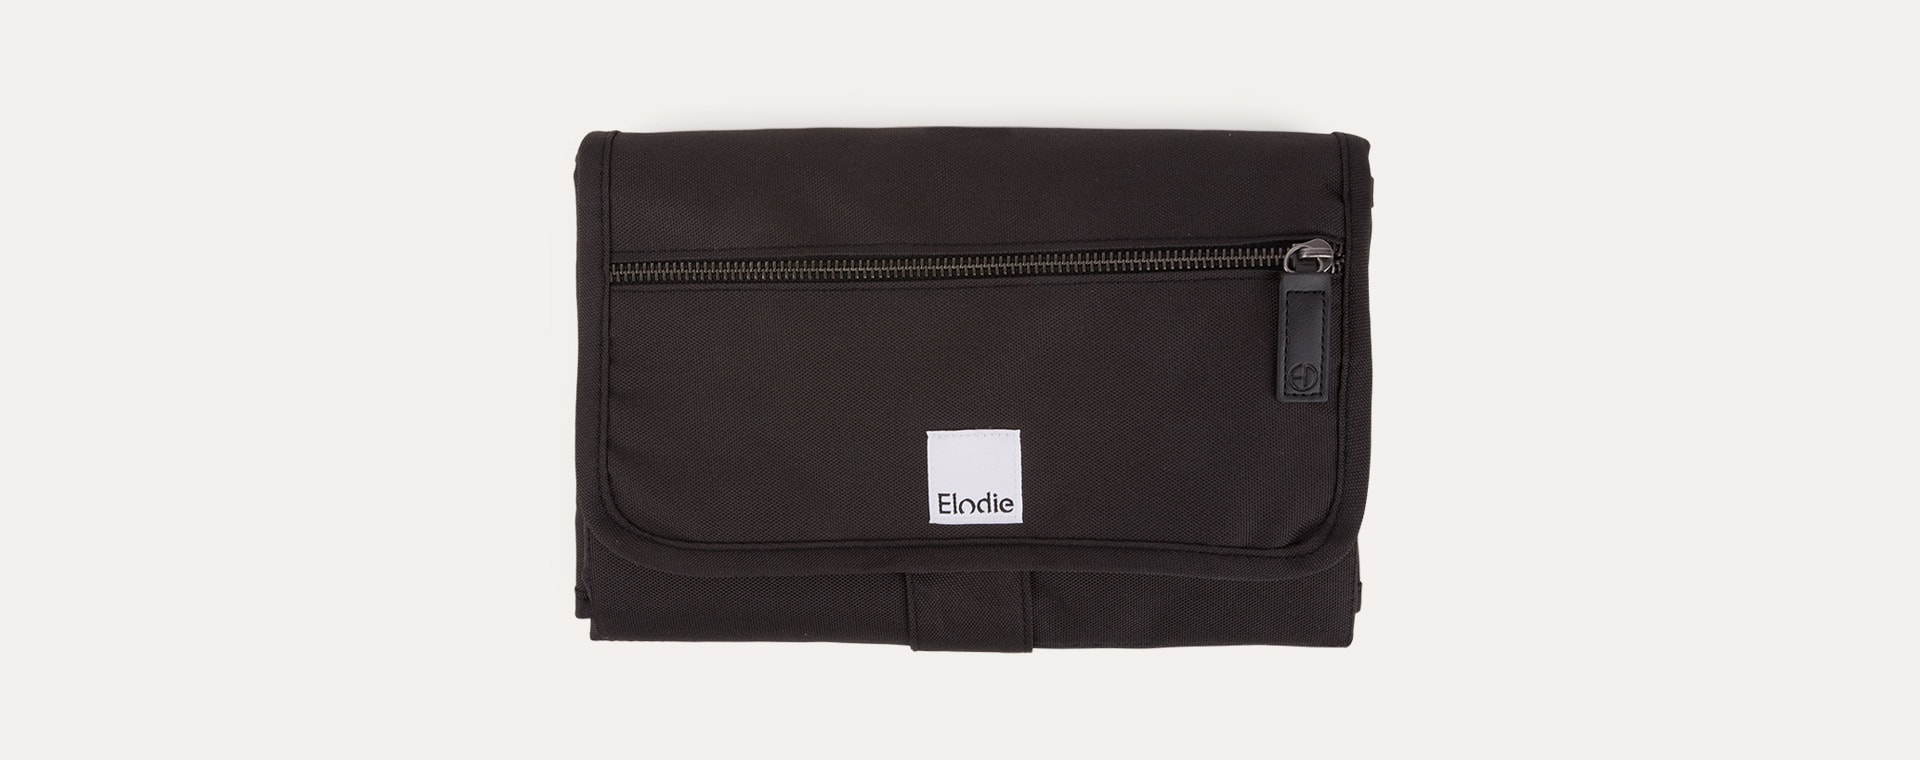 Off Black Elodie Portable Changing Pad